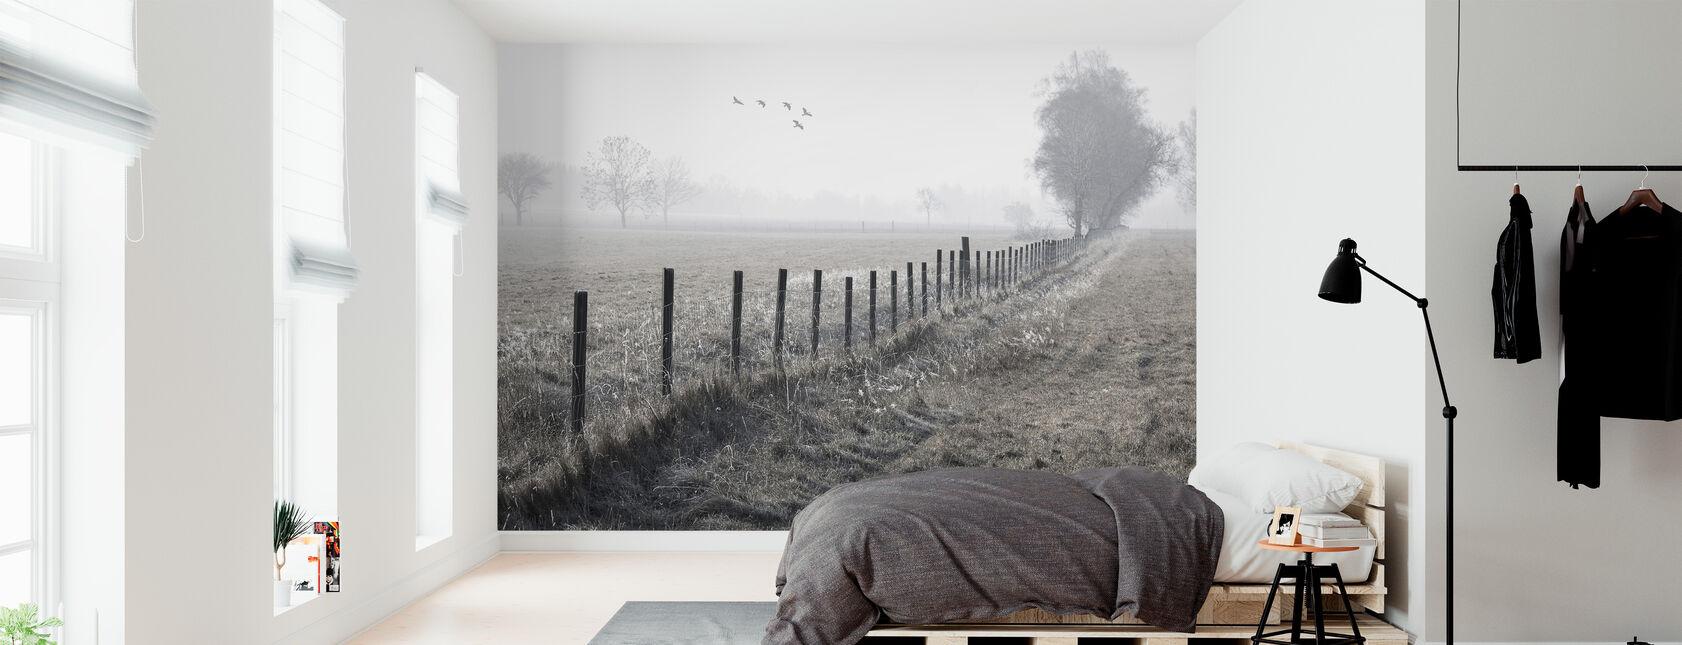 Sumuinen aamu - Tapetti - Makuuhuone